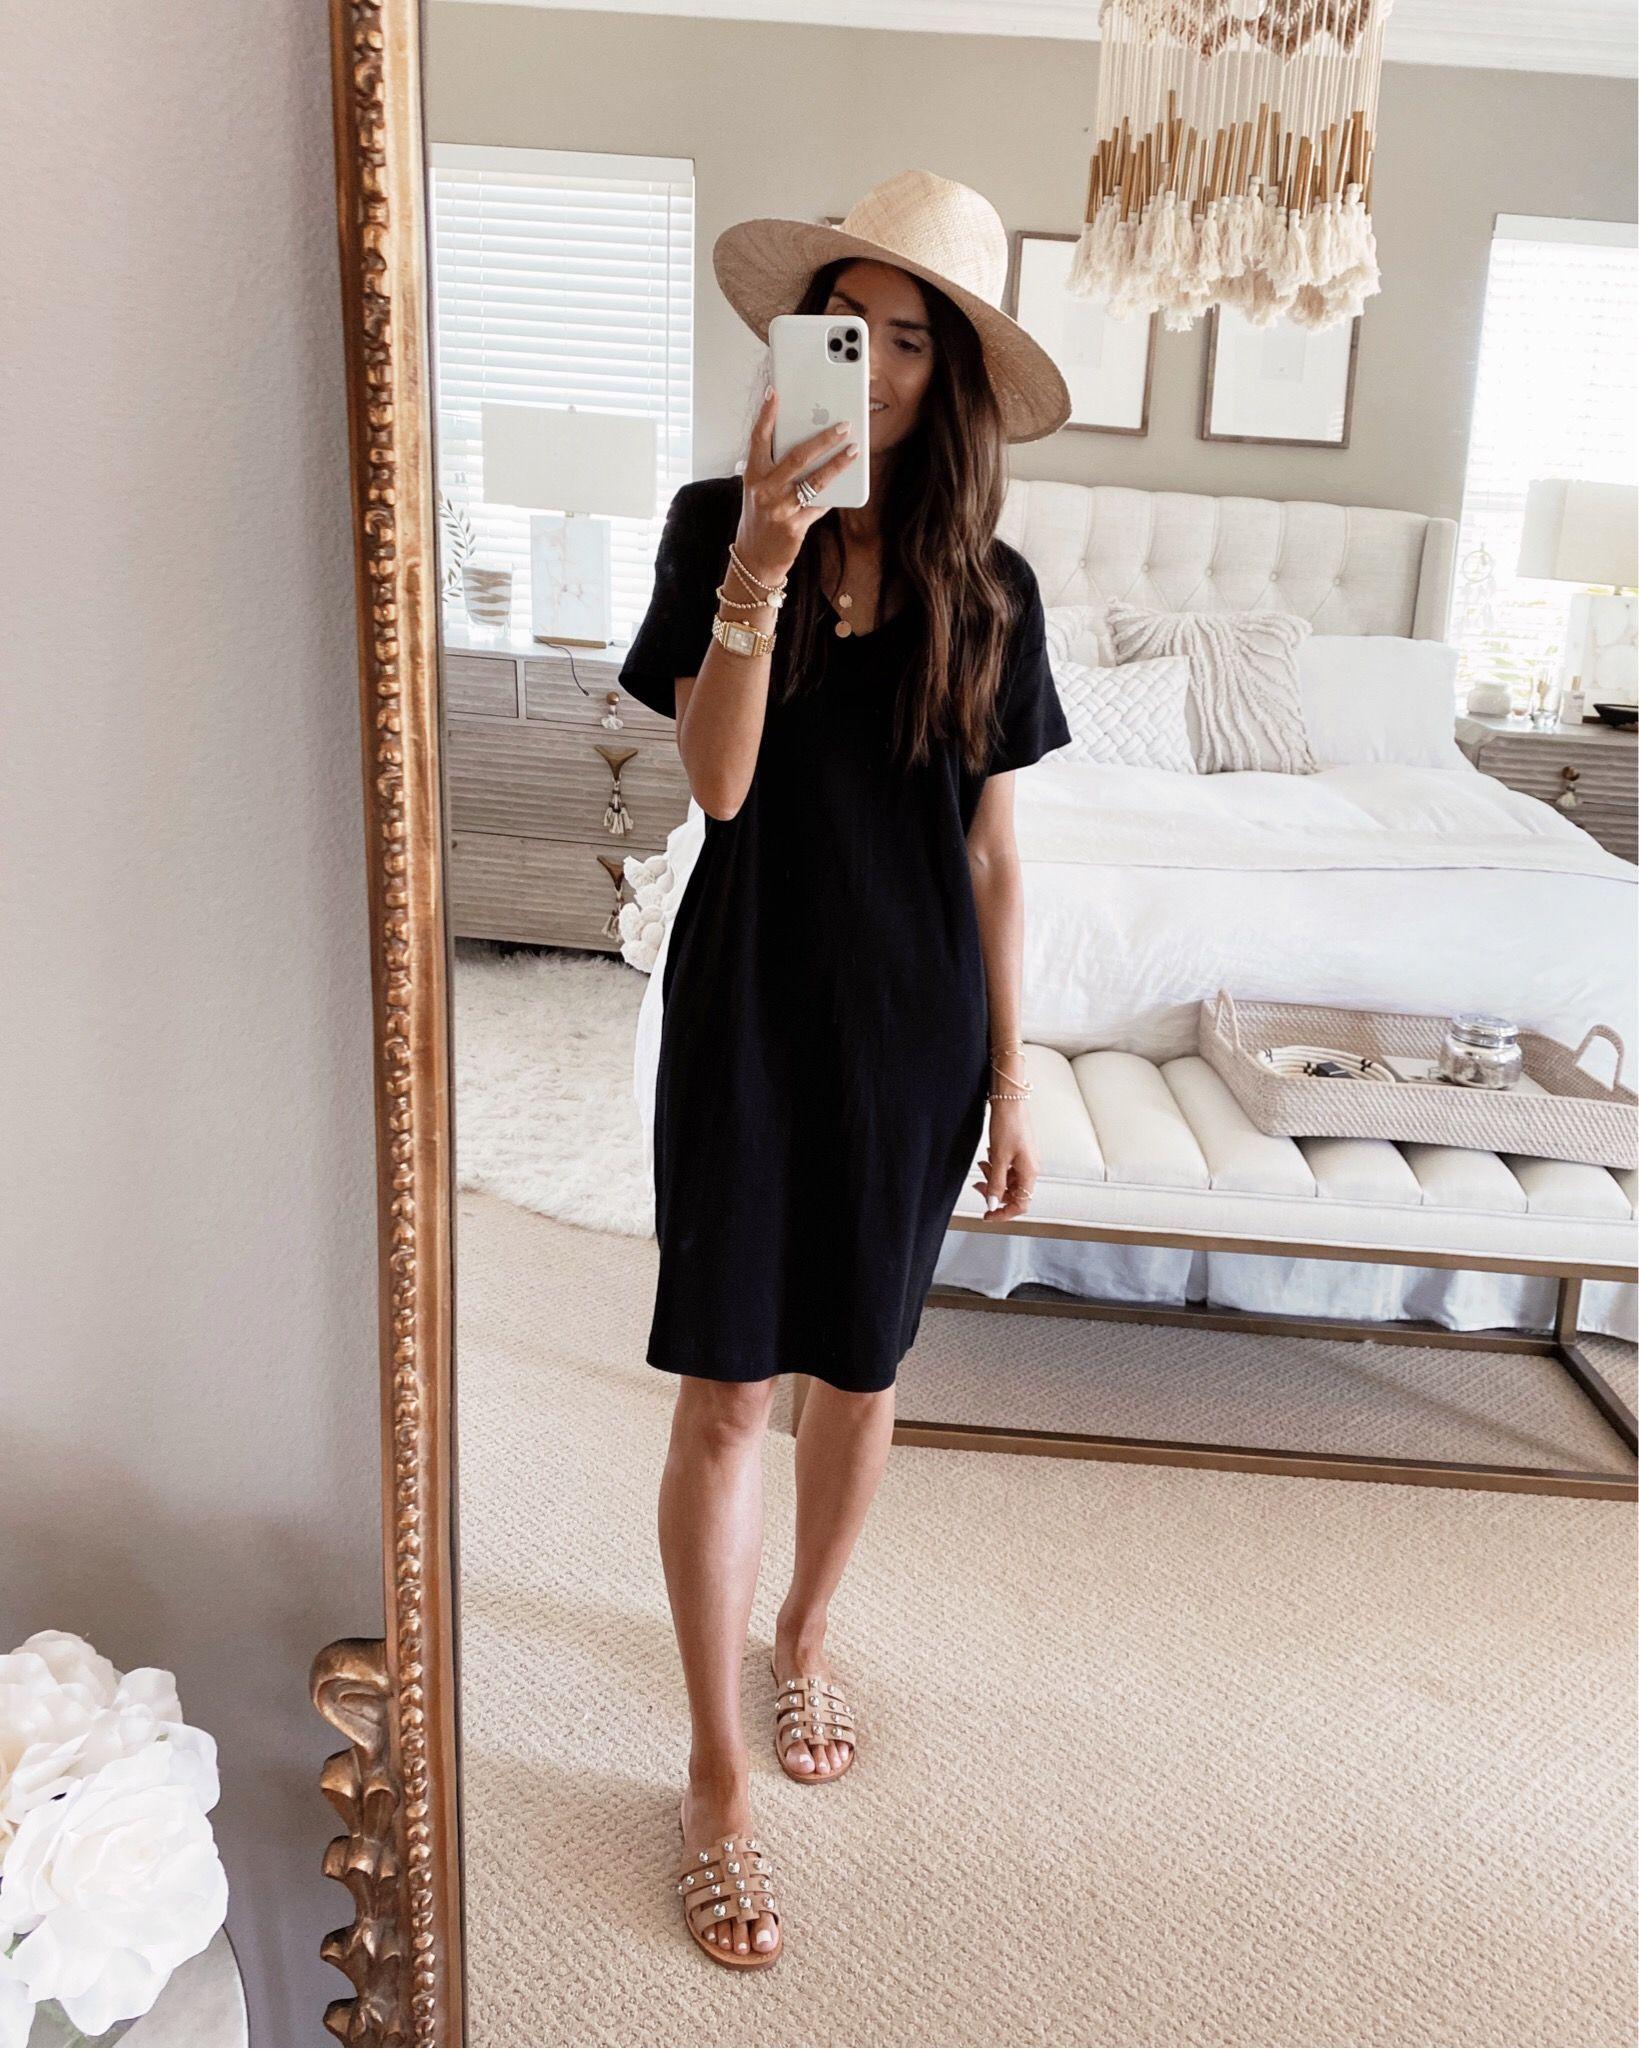 Black Day Dress Summer Black Dress Black Dresses Casual Black Dress Accessories [ 2049 x 1639 Pixel ]